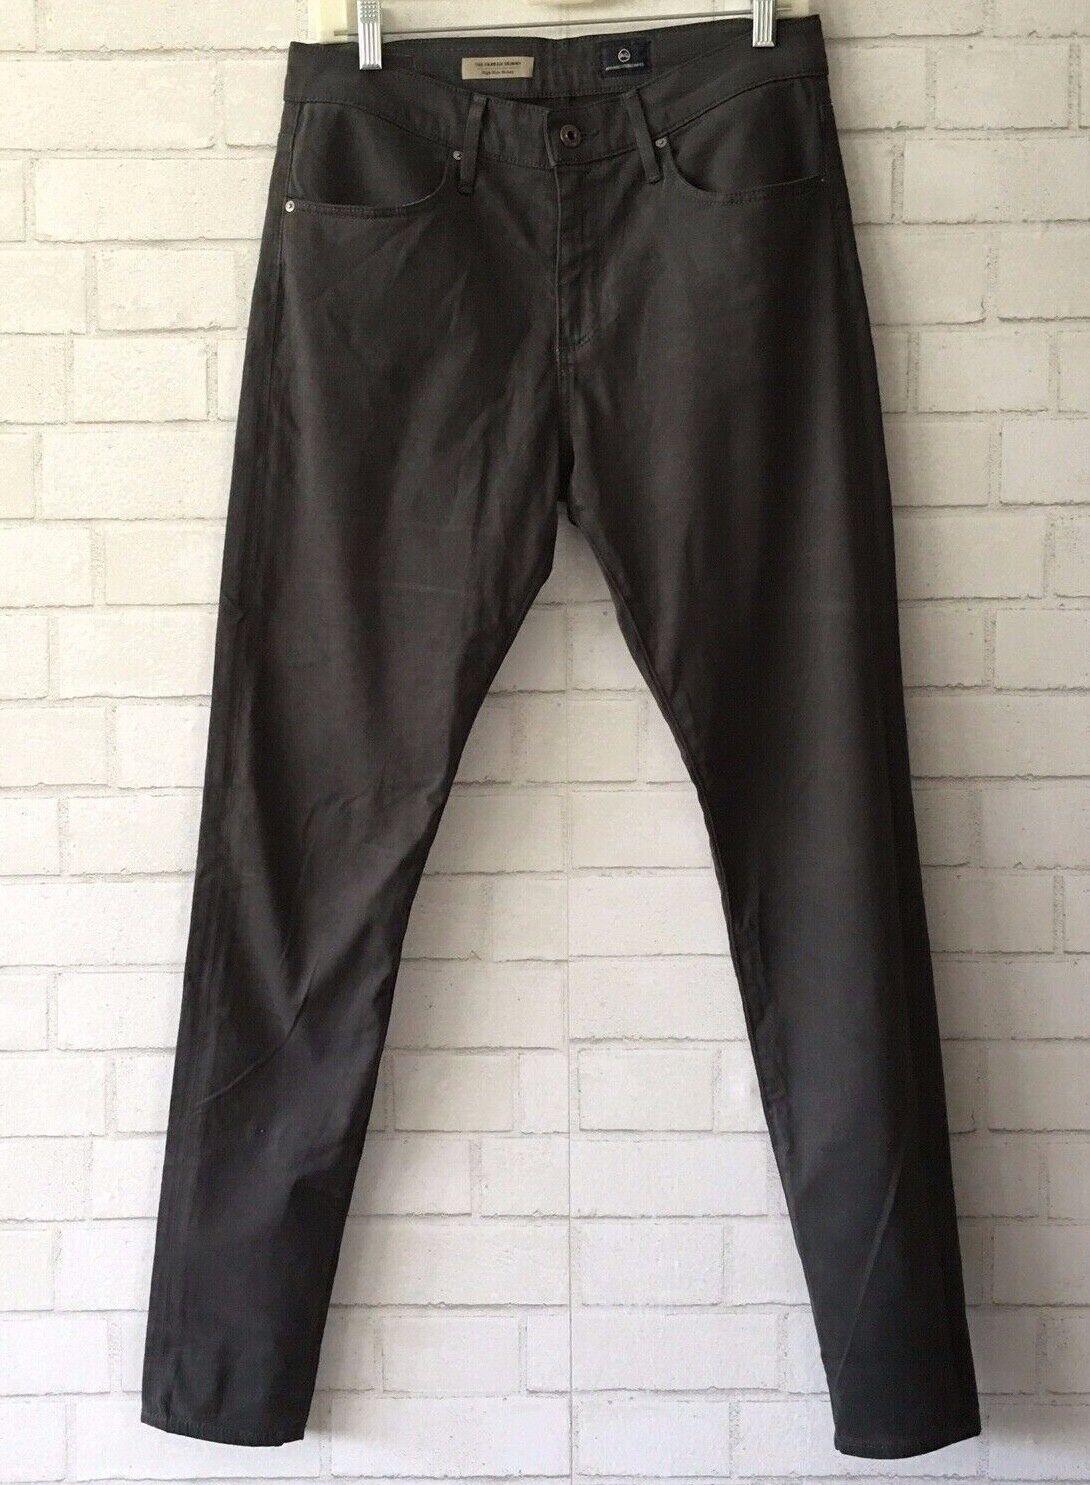 AG Adriano goldschmied The Farrah Modal Blend Dark Grey Skinny Pants Size 30R